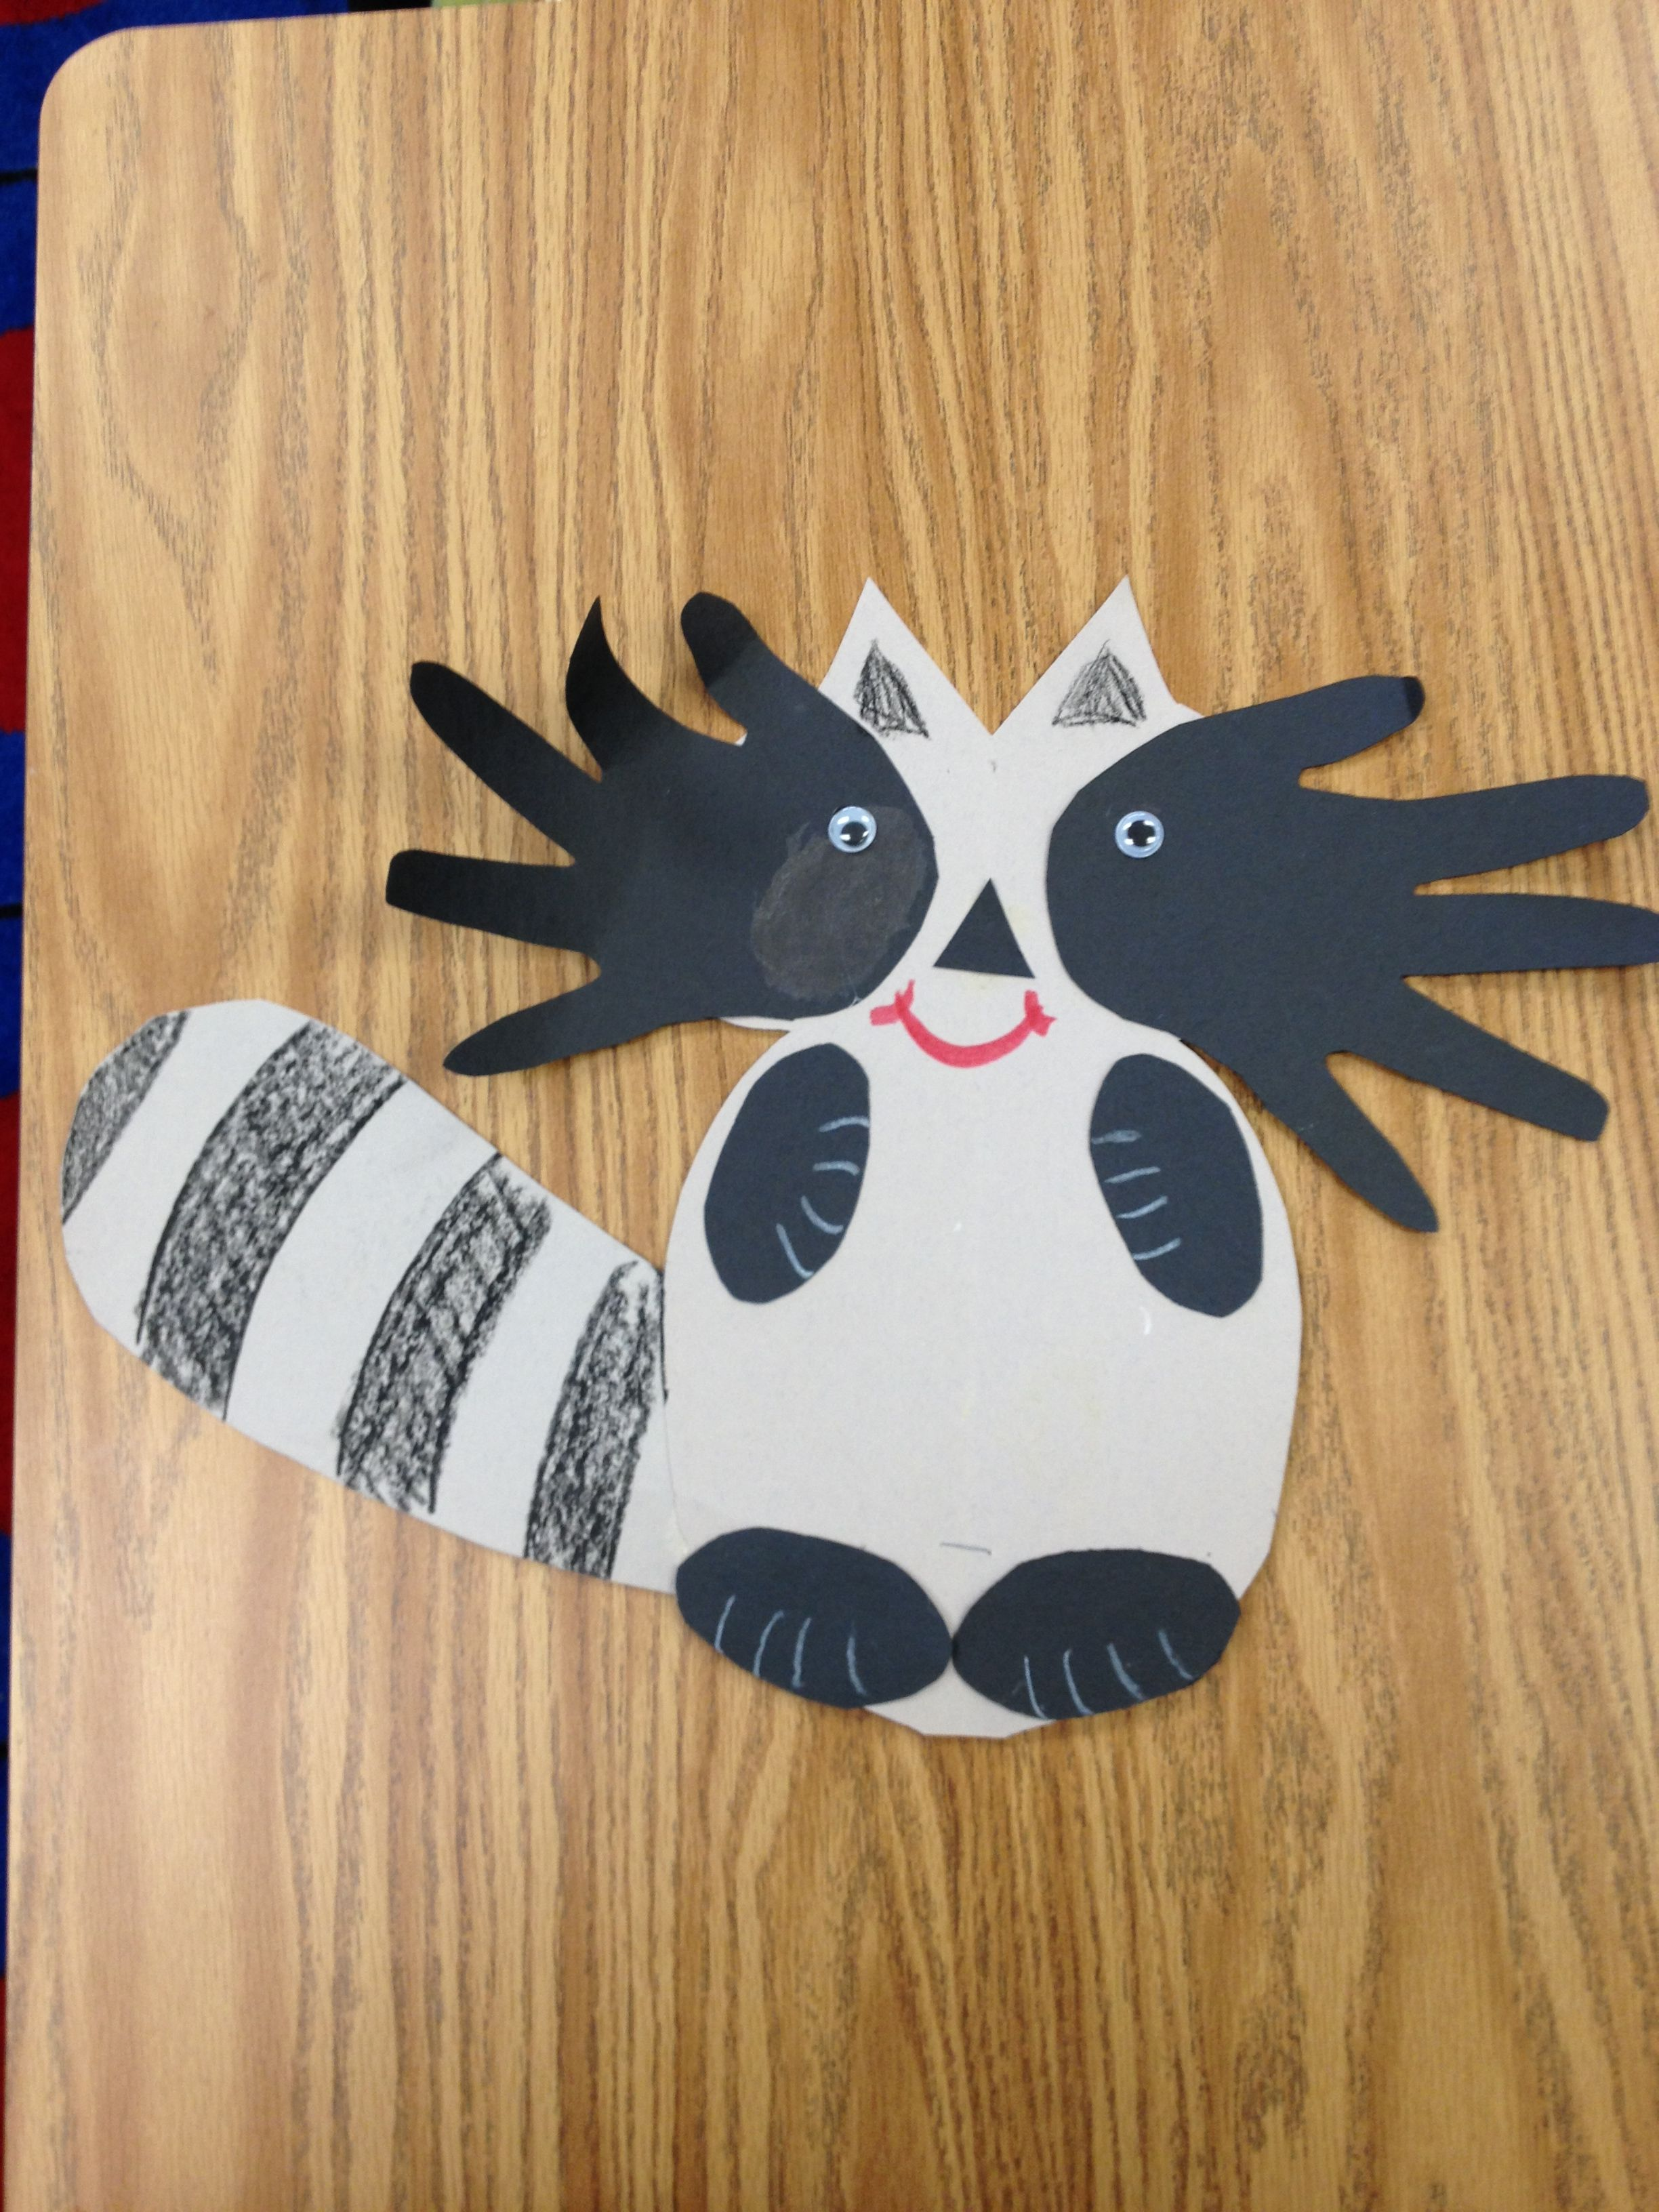 Raccoon Nocturnal Animals Bulletin Board | Preschool | Pinterest ...